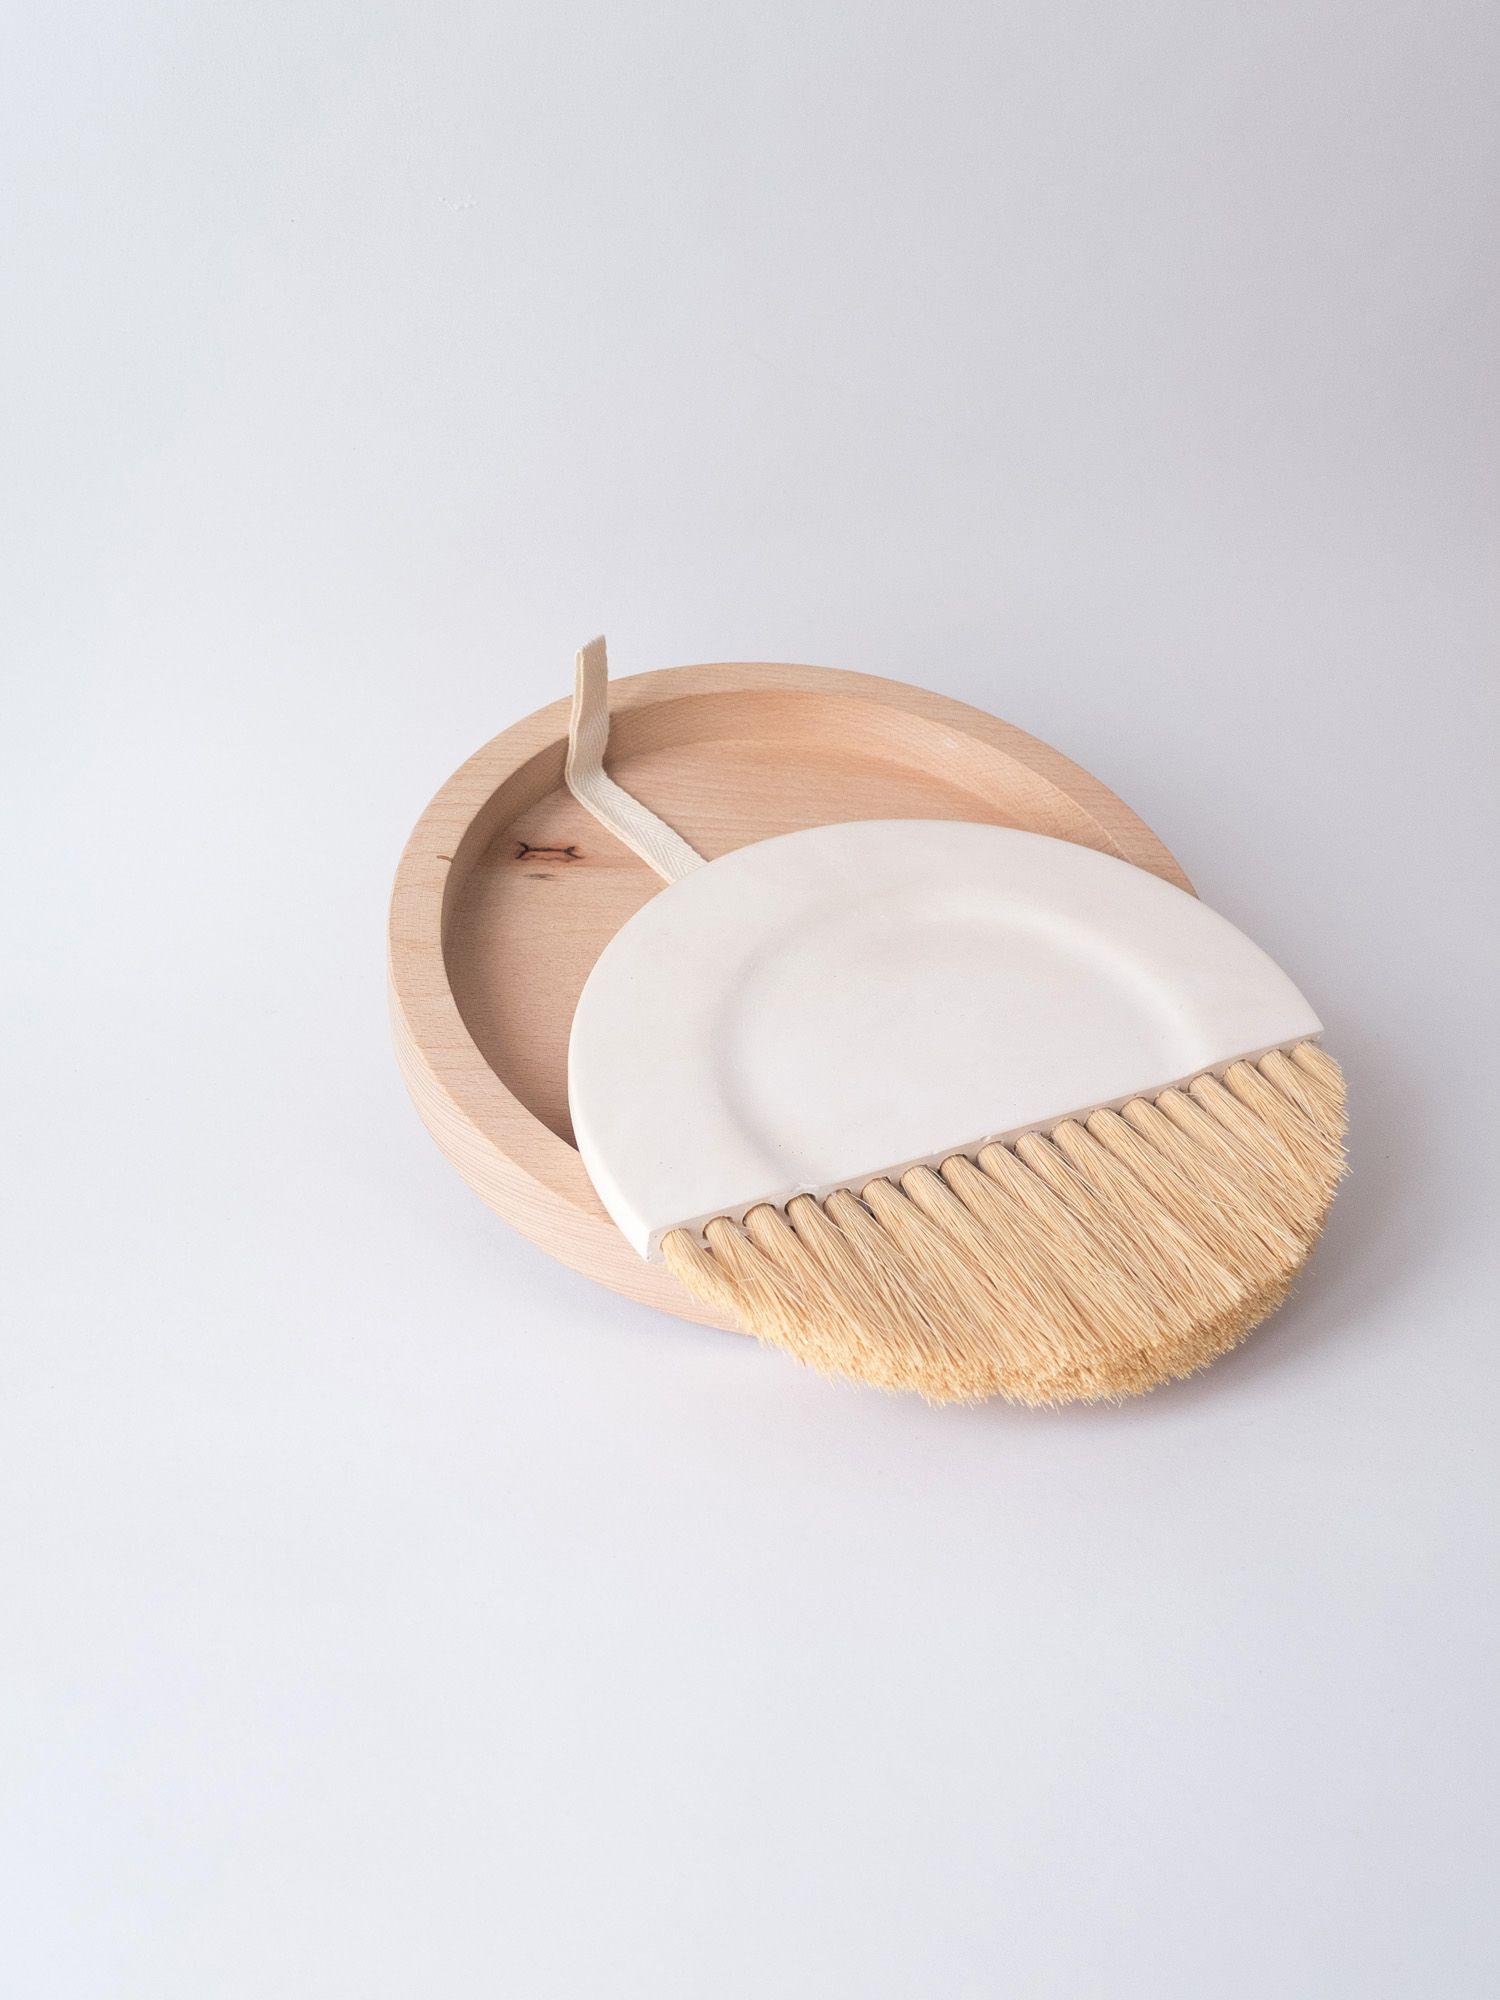 M s de 25 ideas incre bles sobre objetos decorativos en for Objetos decorativos para oficina